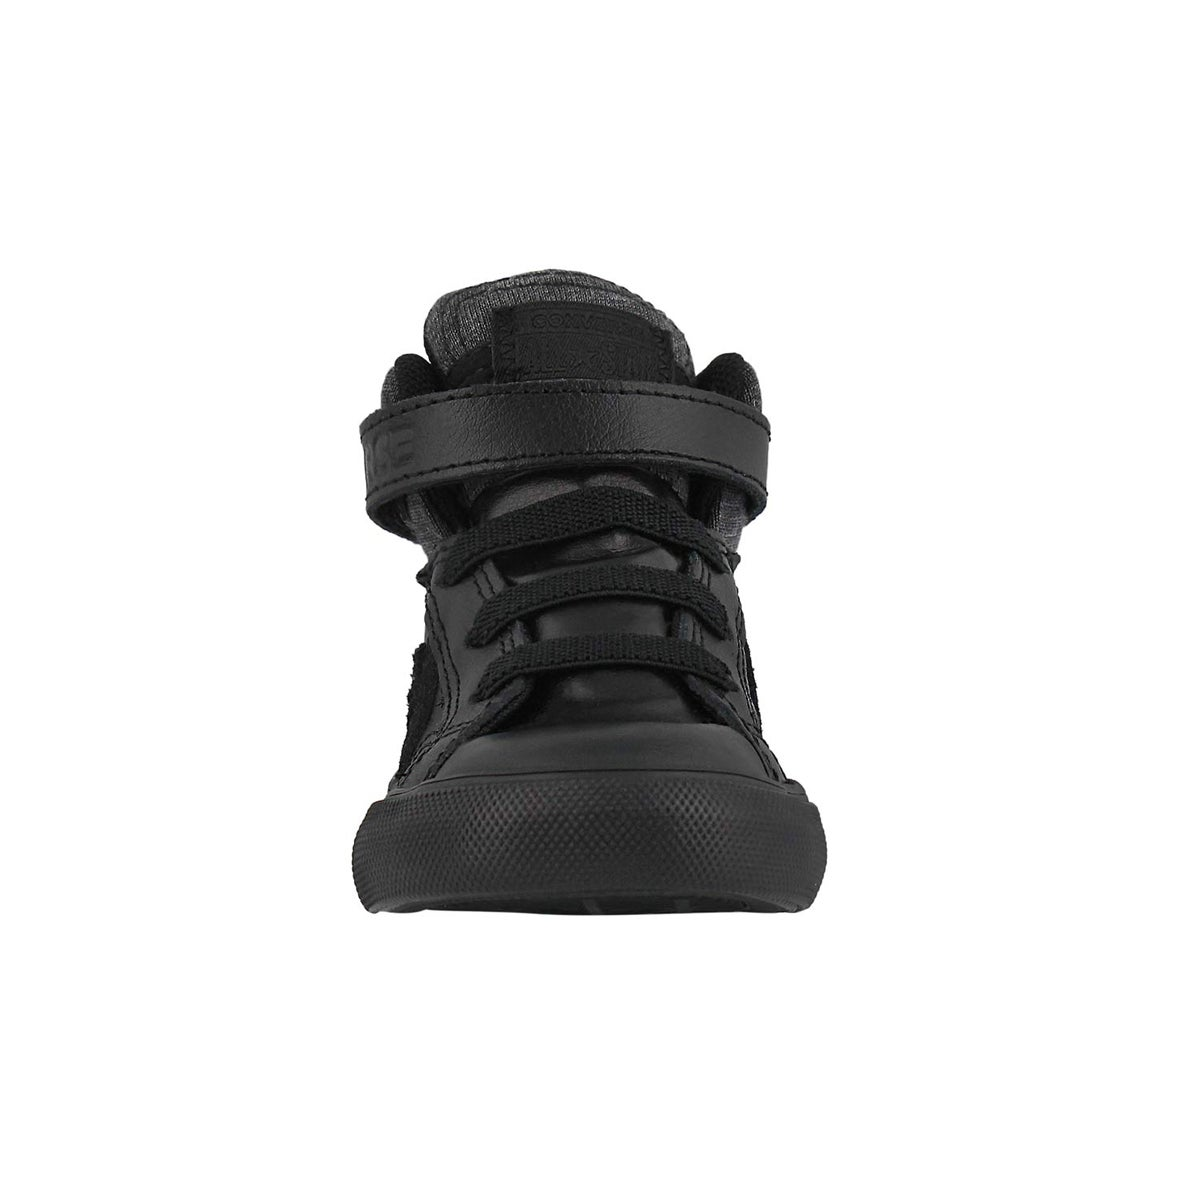 Inf-b Pro Blaze Strap blk hi top sneaker